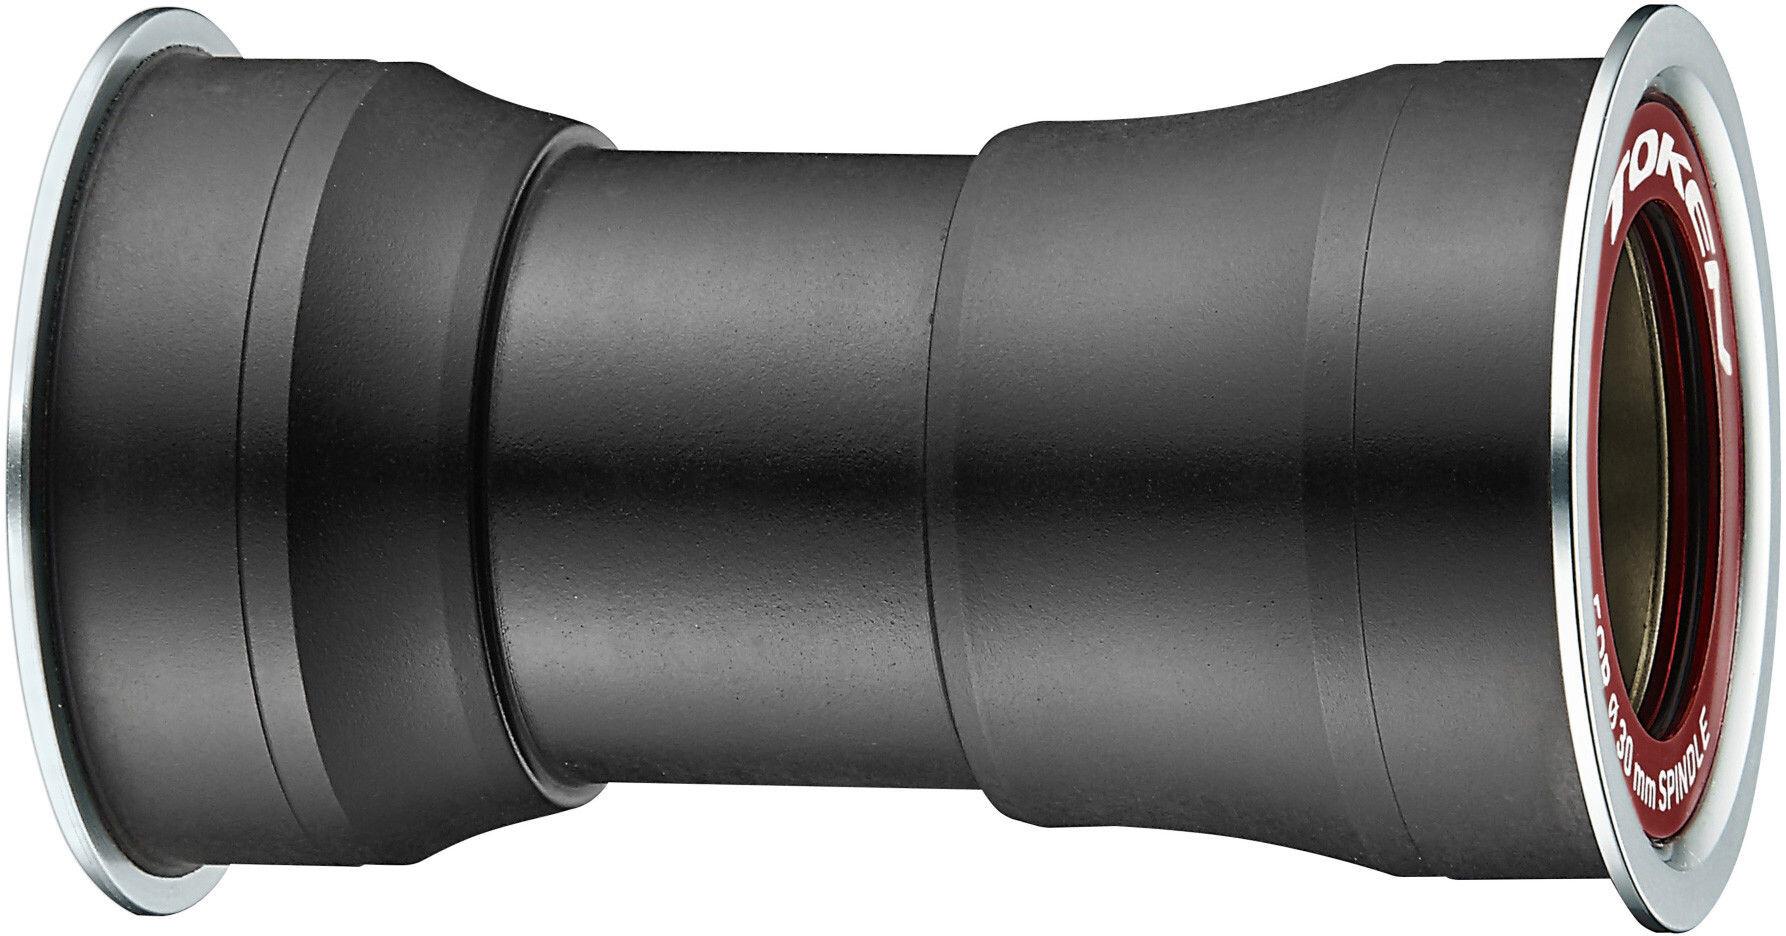 TOKEN Fusion PF30 / BB386 krankboks / KRG SRAM GXP | Krankbokse